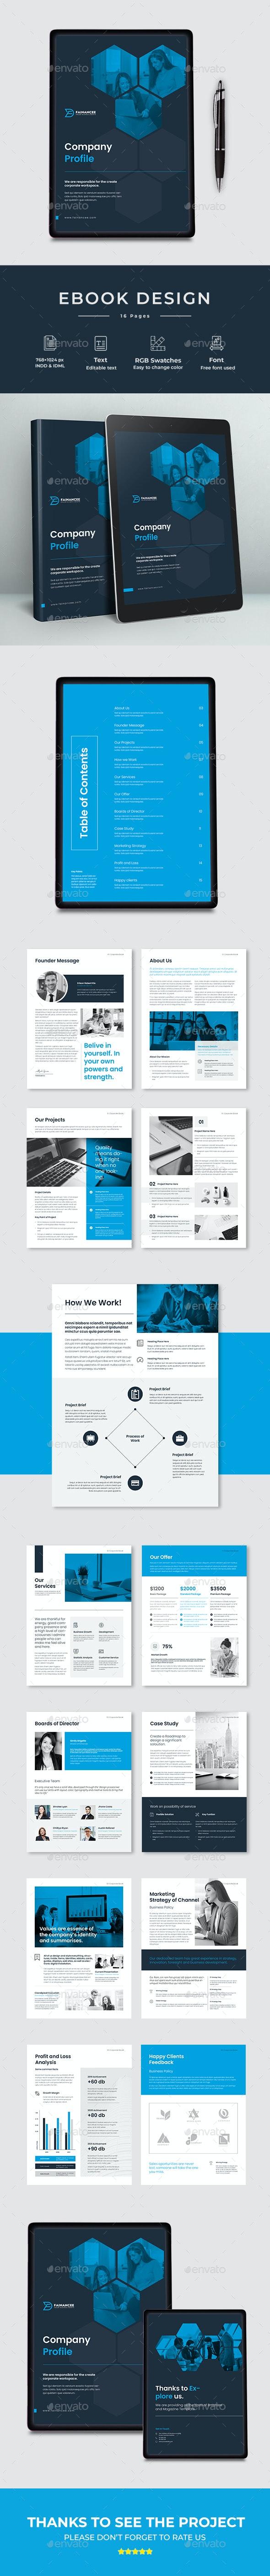 Corporate Ebook Template - Digital Books ePublishing